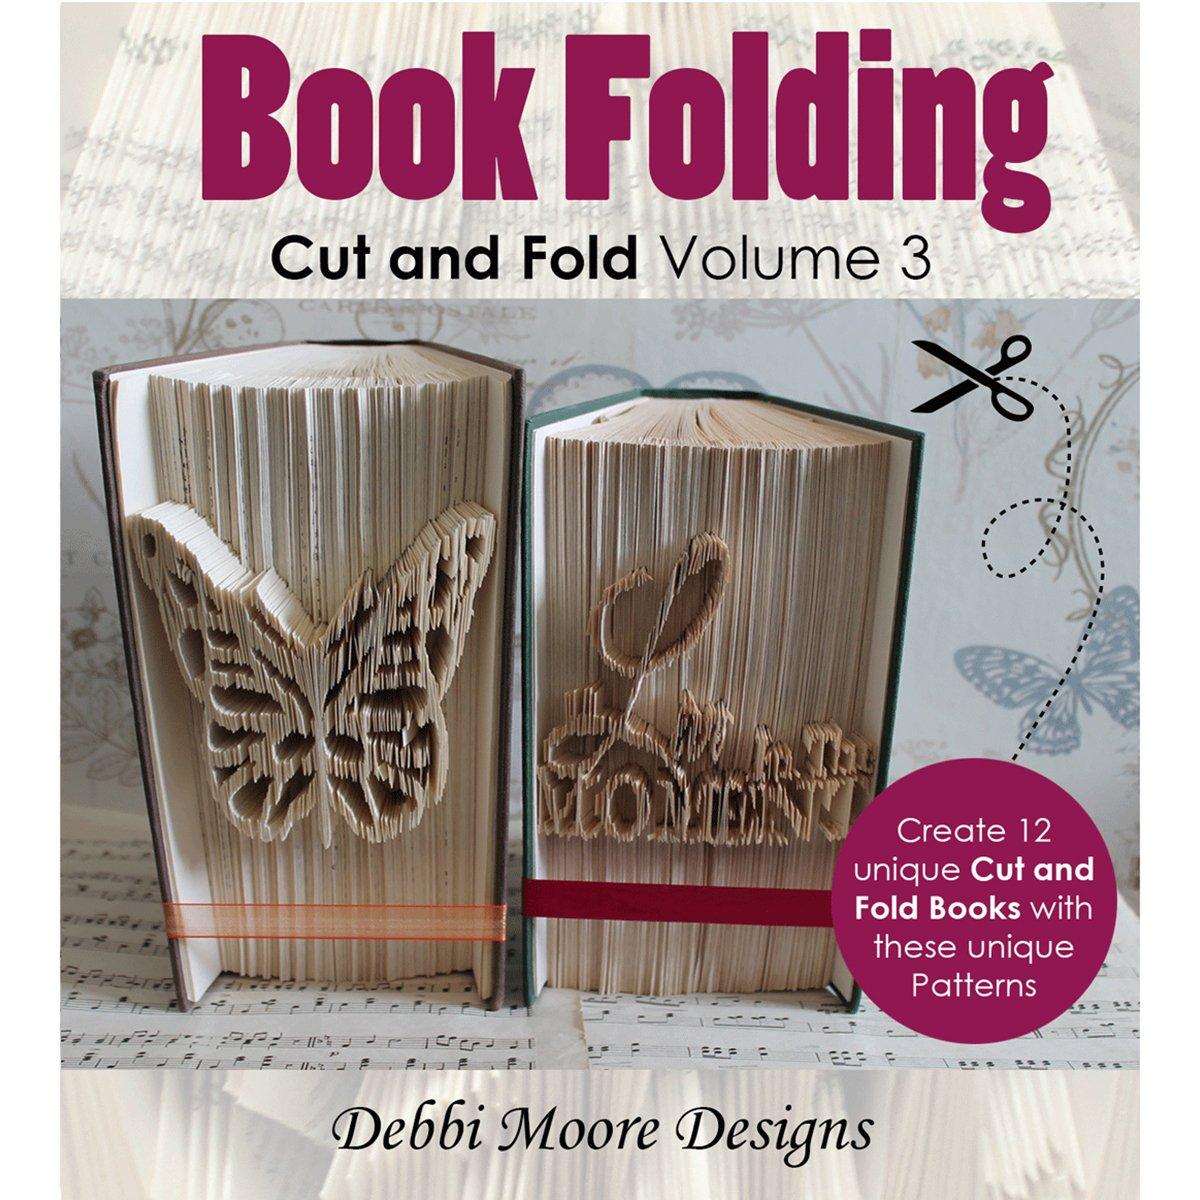 Mini Lower Times New Roman Alpha 4A Debbi Moore Designs CDSET422 Debbi Moore CD ROM Cut /& Fold Book Folding Patterns